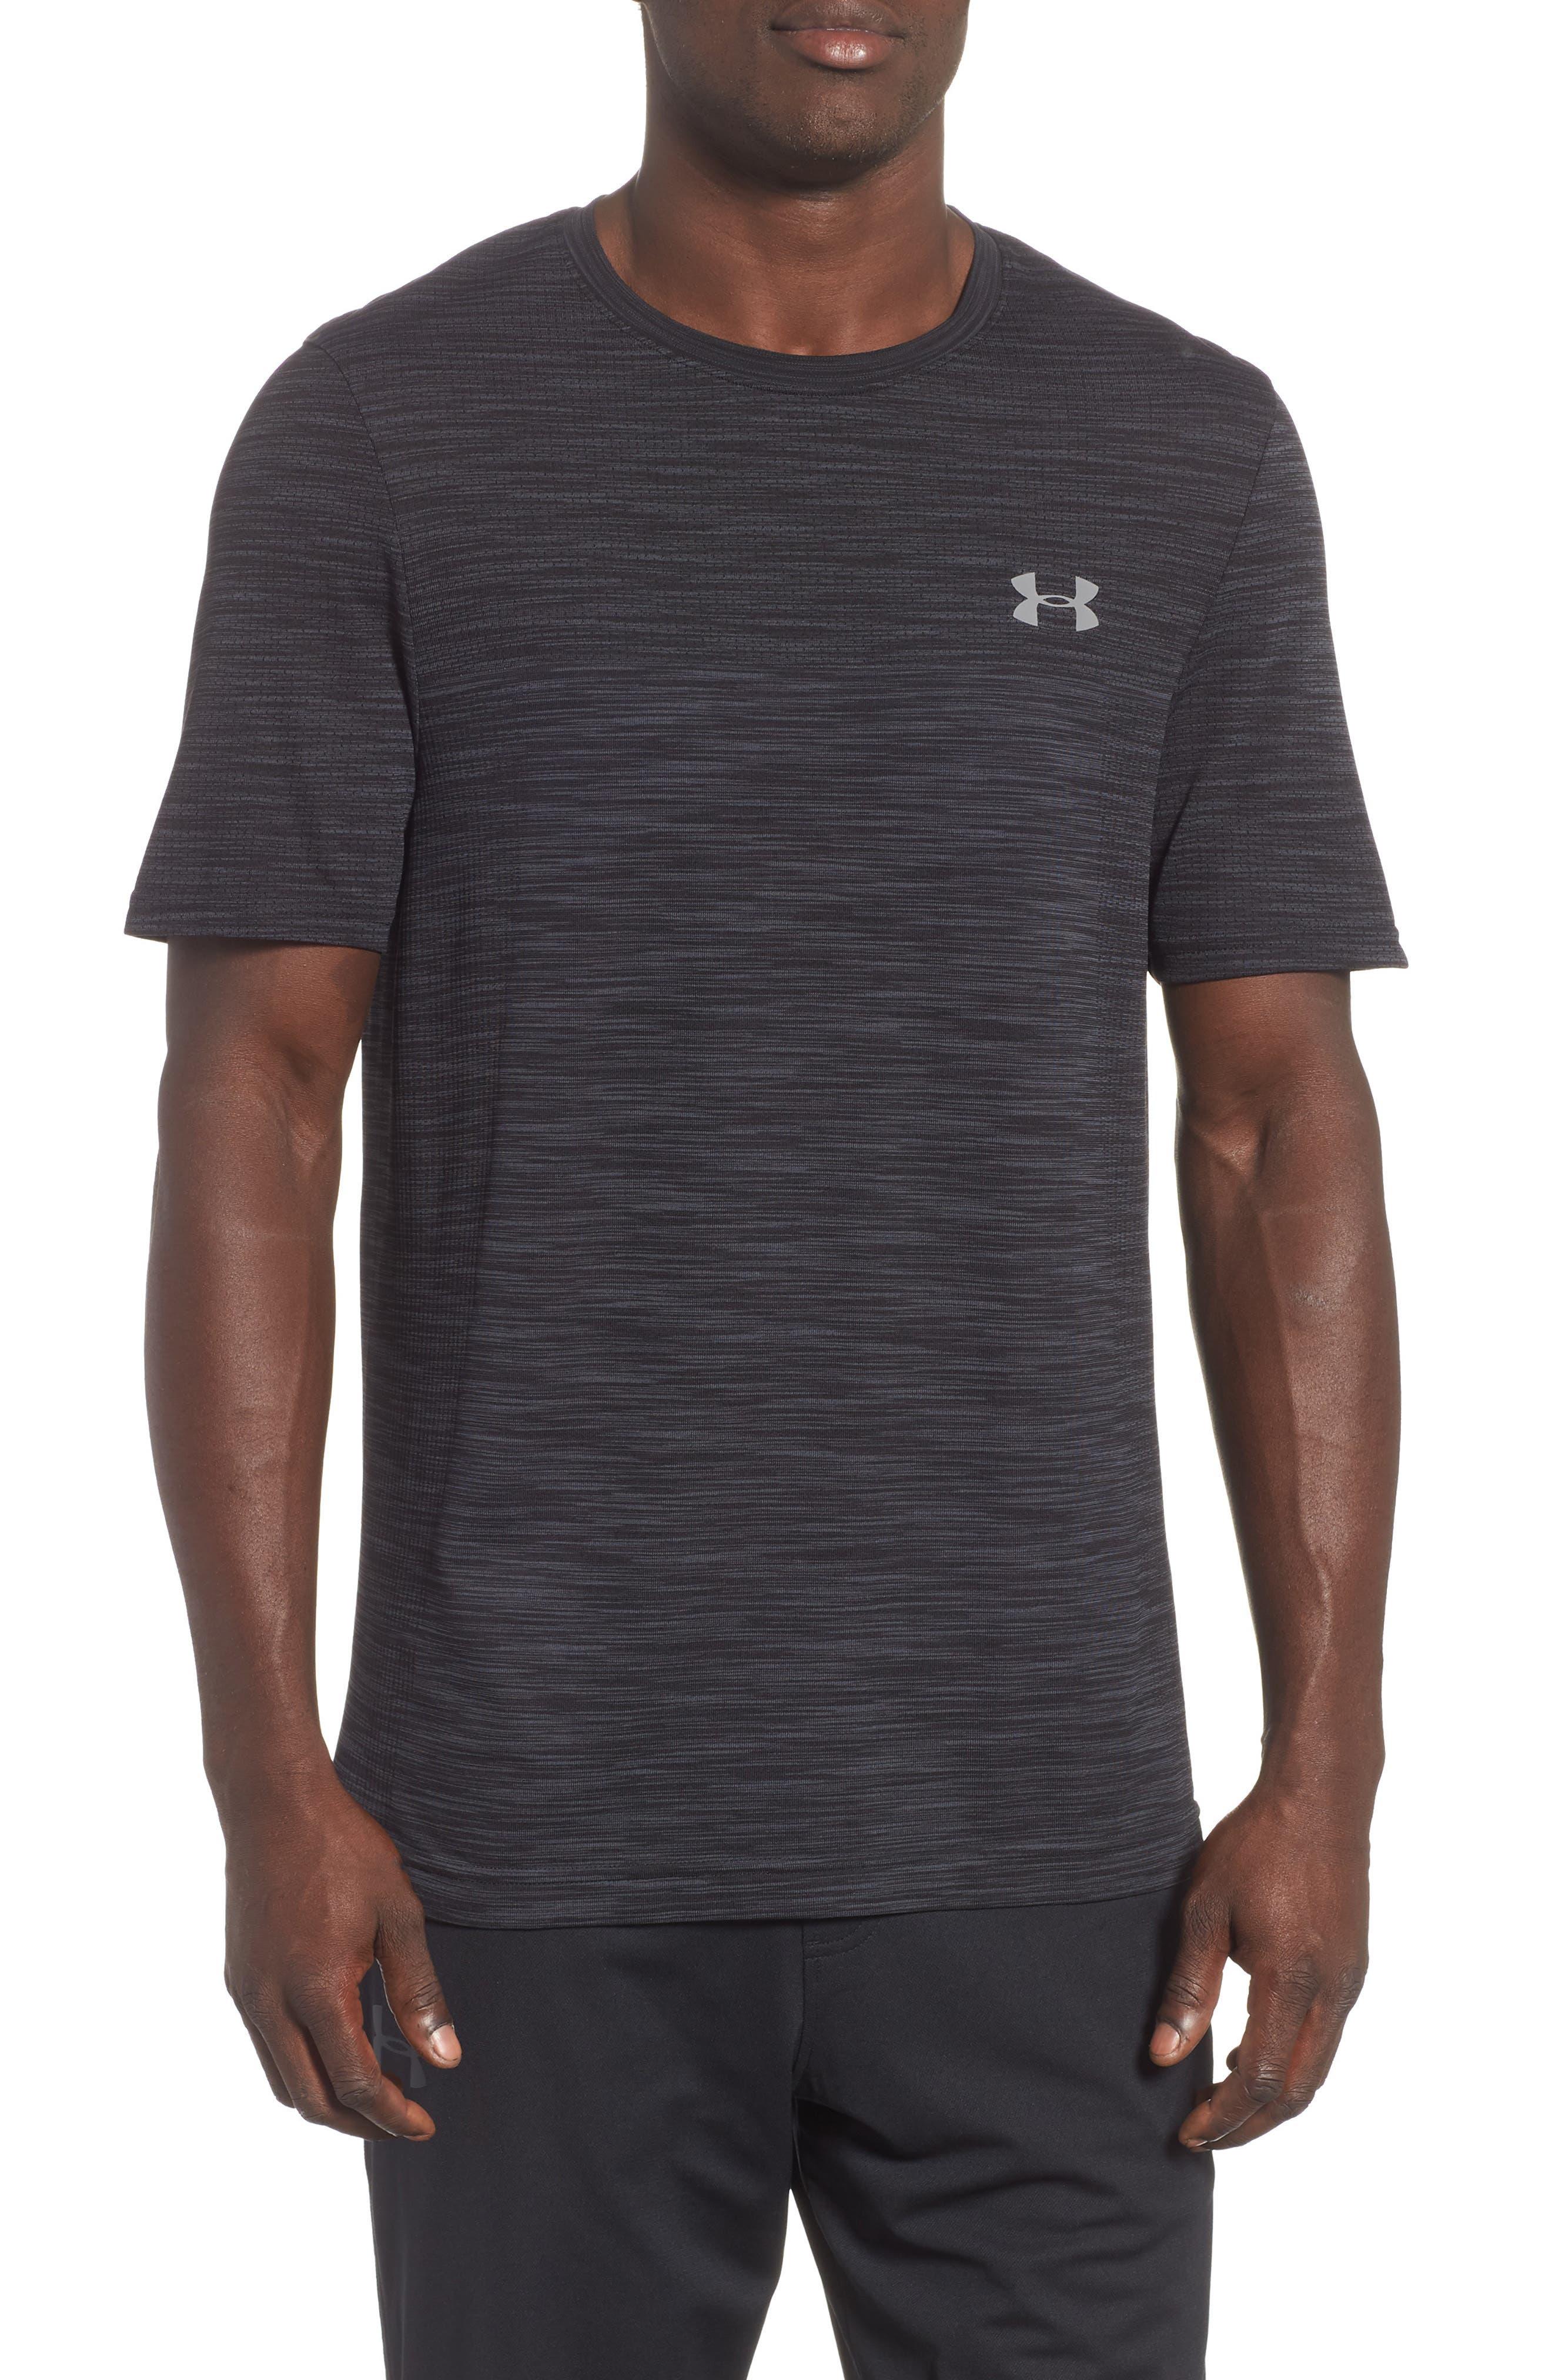 Siphon Performance T-Shirt,                             Main thumbnail 1, color,                             BLACK